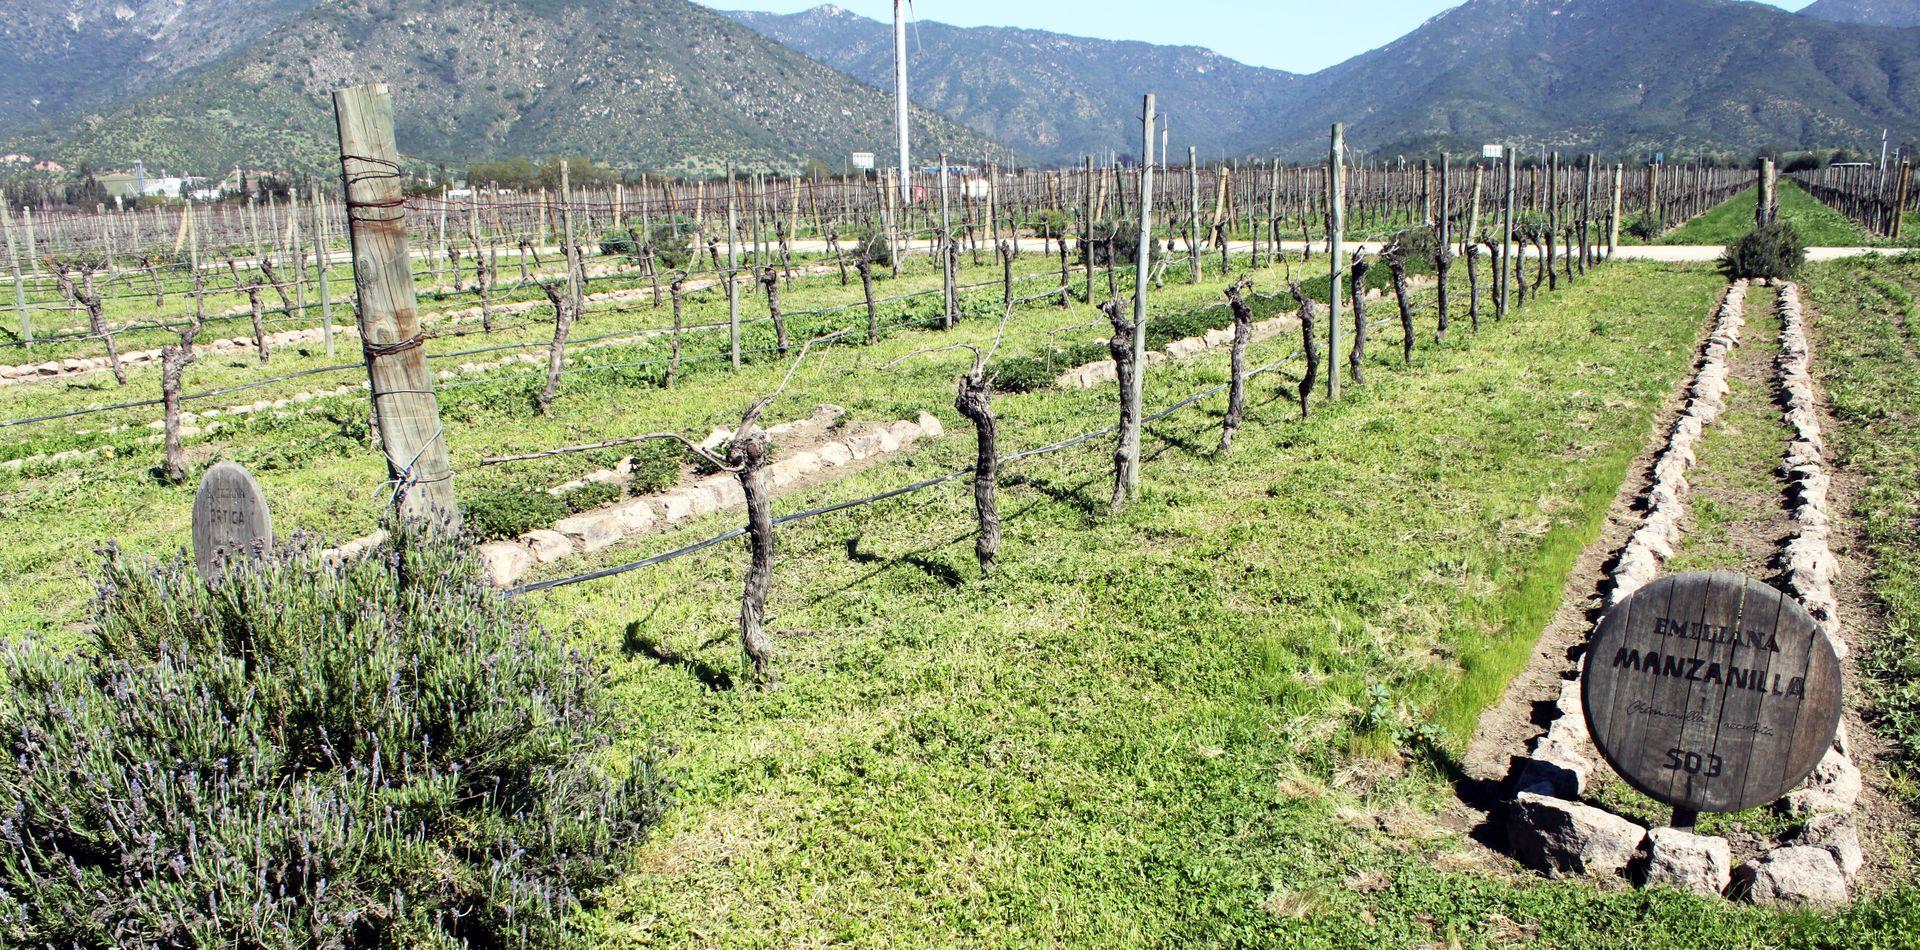 vinicola-emiliana-valle-de-casa-blanca-chile-05